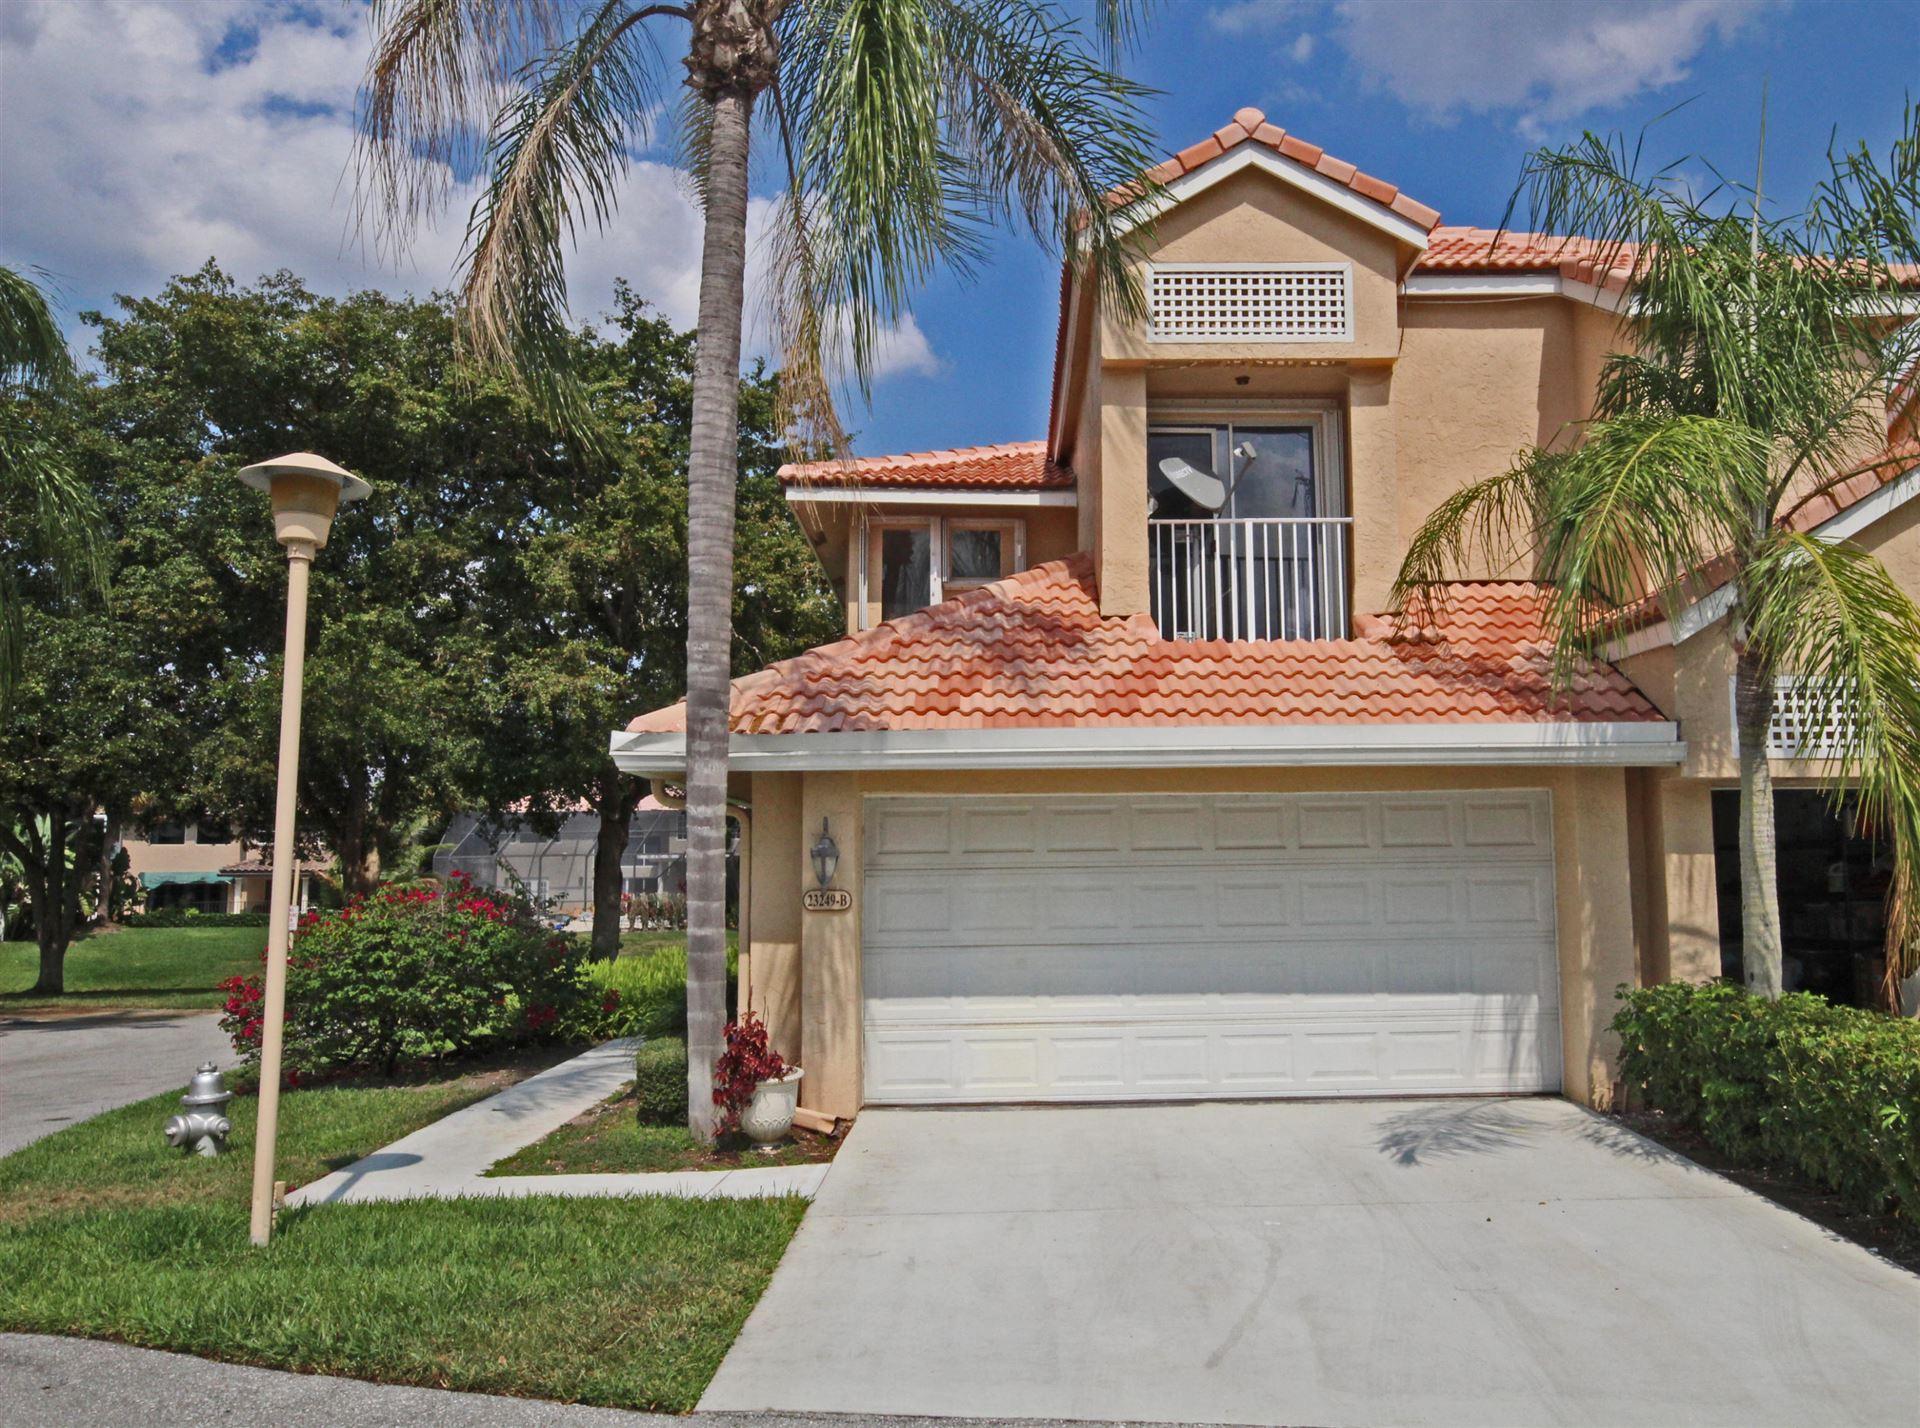 23249 Island View #B, Boca Raton, FL 33433 - #: RX-10619390